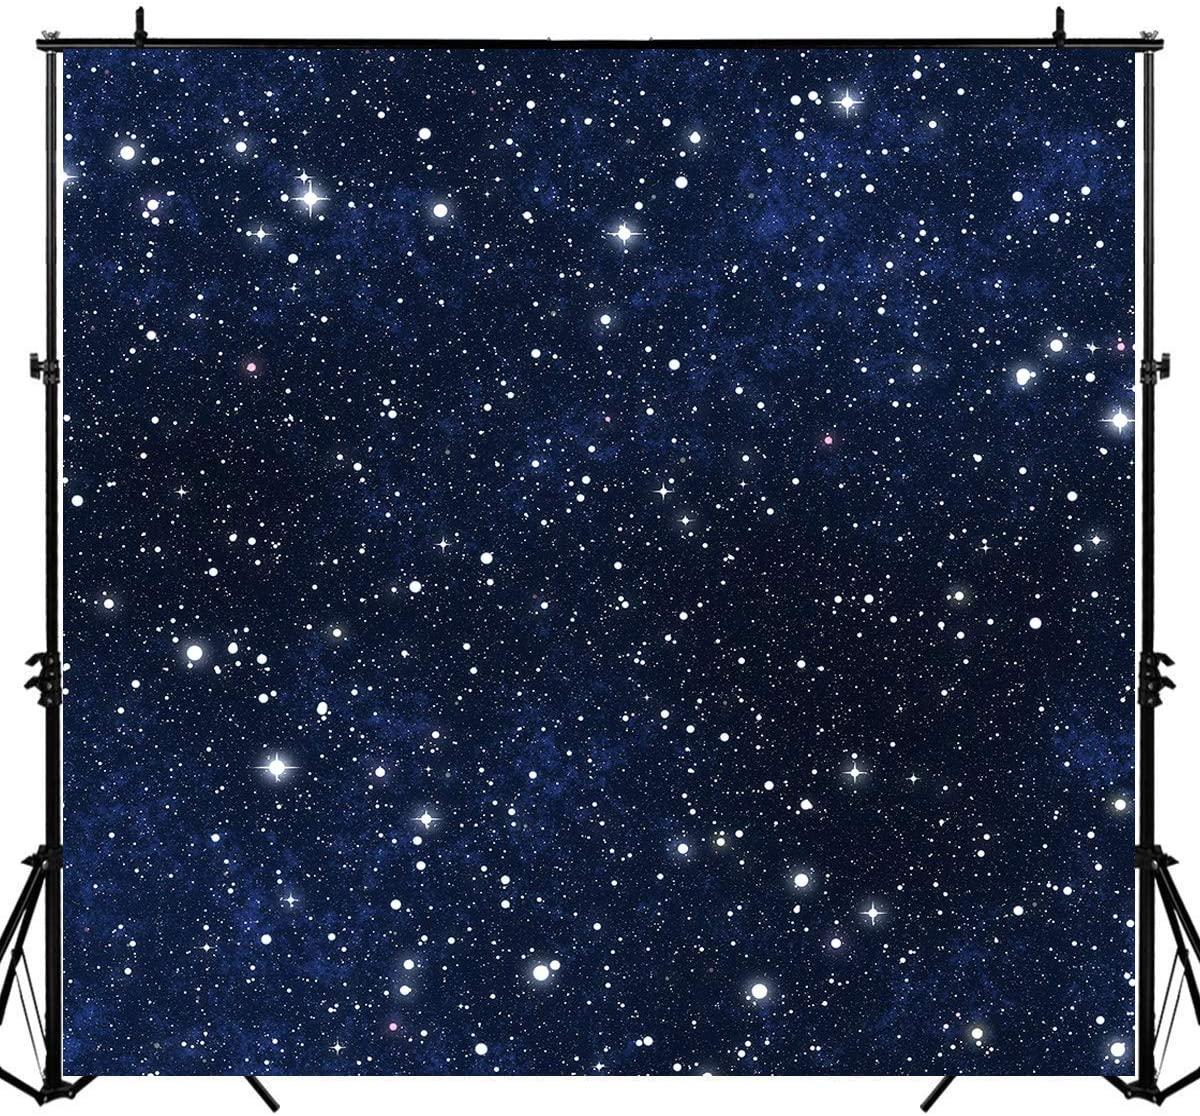 Sensfun Night Sky Star Backdrop Universe Space Theme Starry Photography Backdrops Galaxy Stars Birthday Photo Studio Booth Background 6x6ft